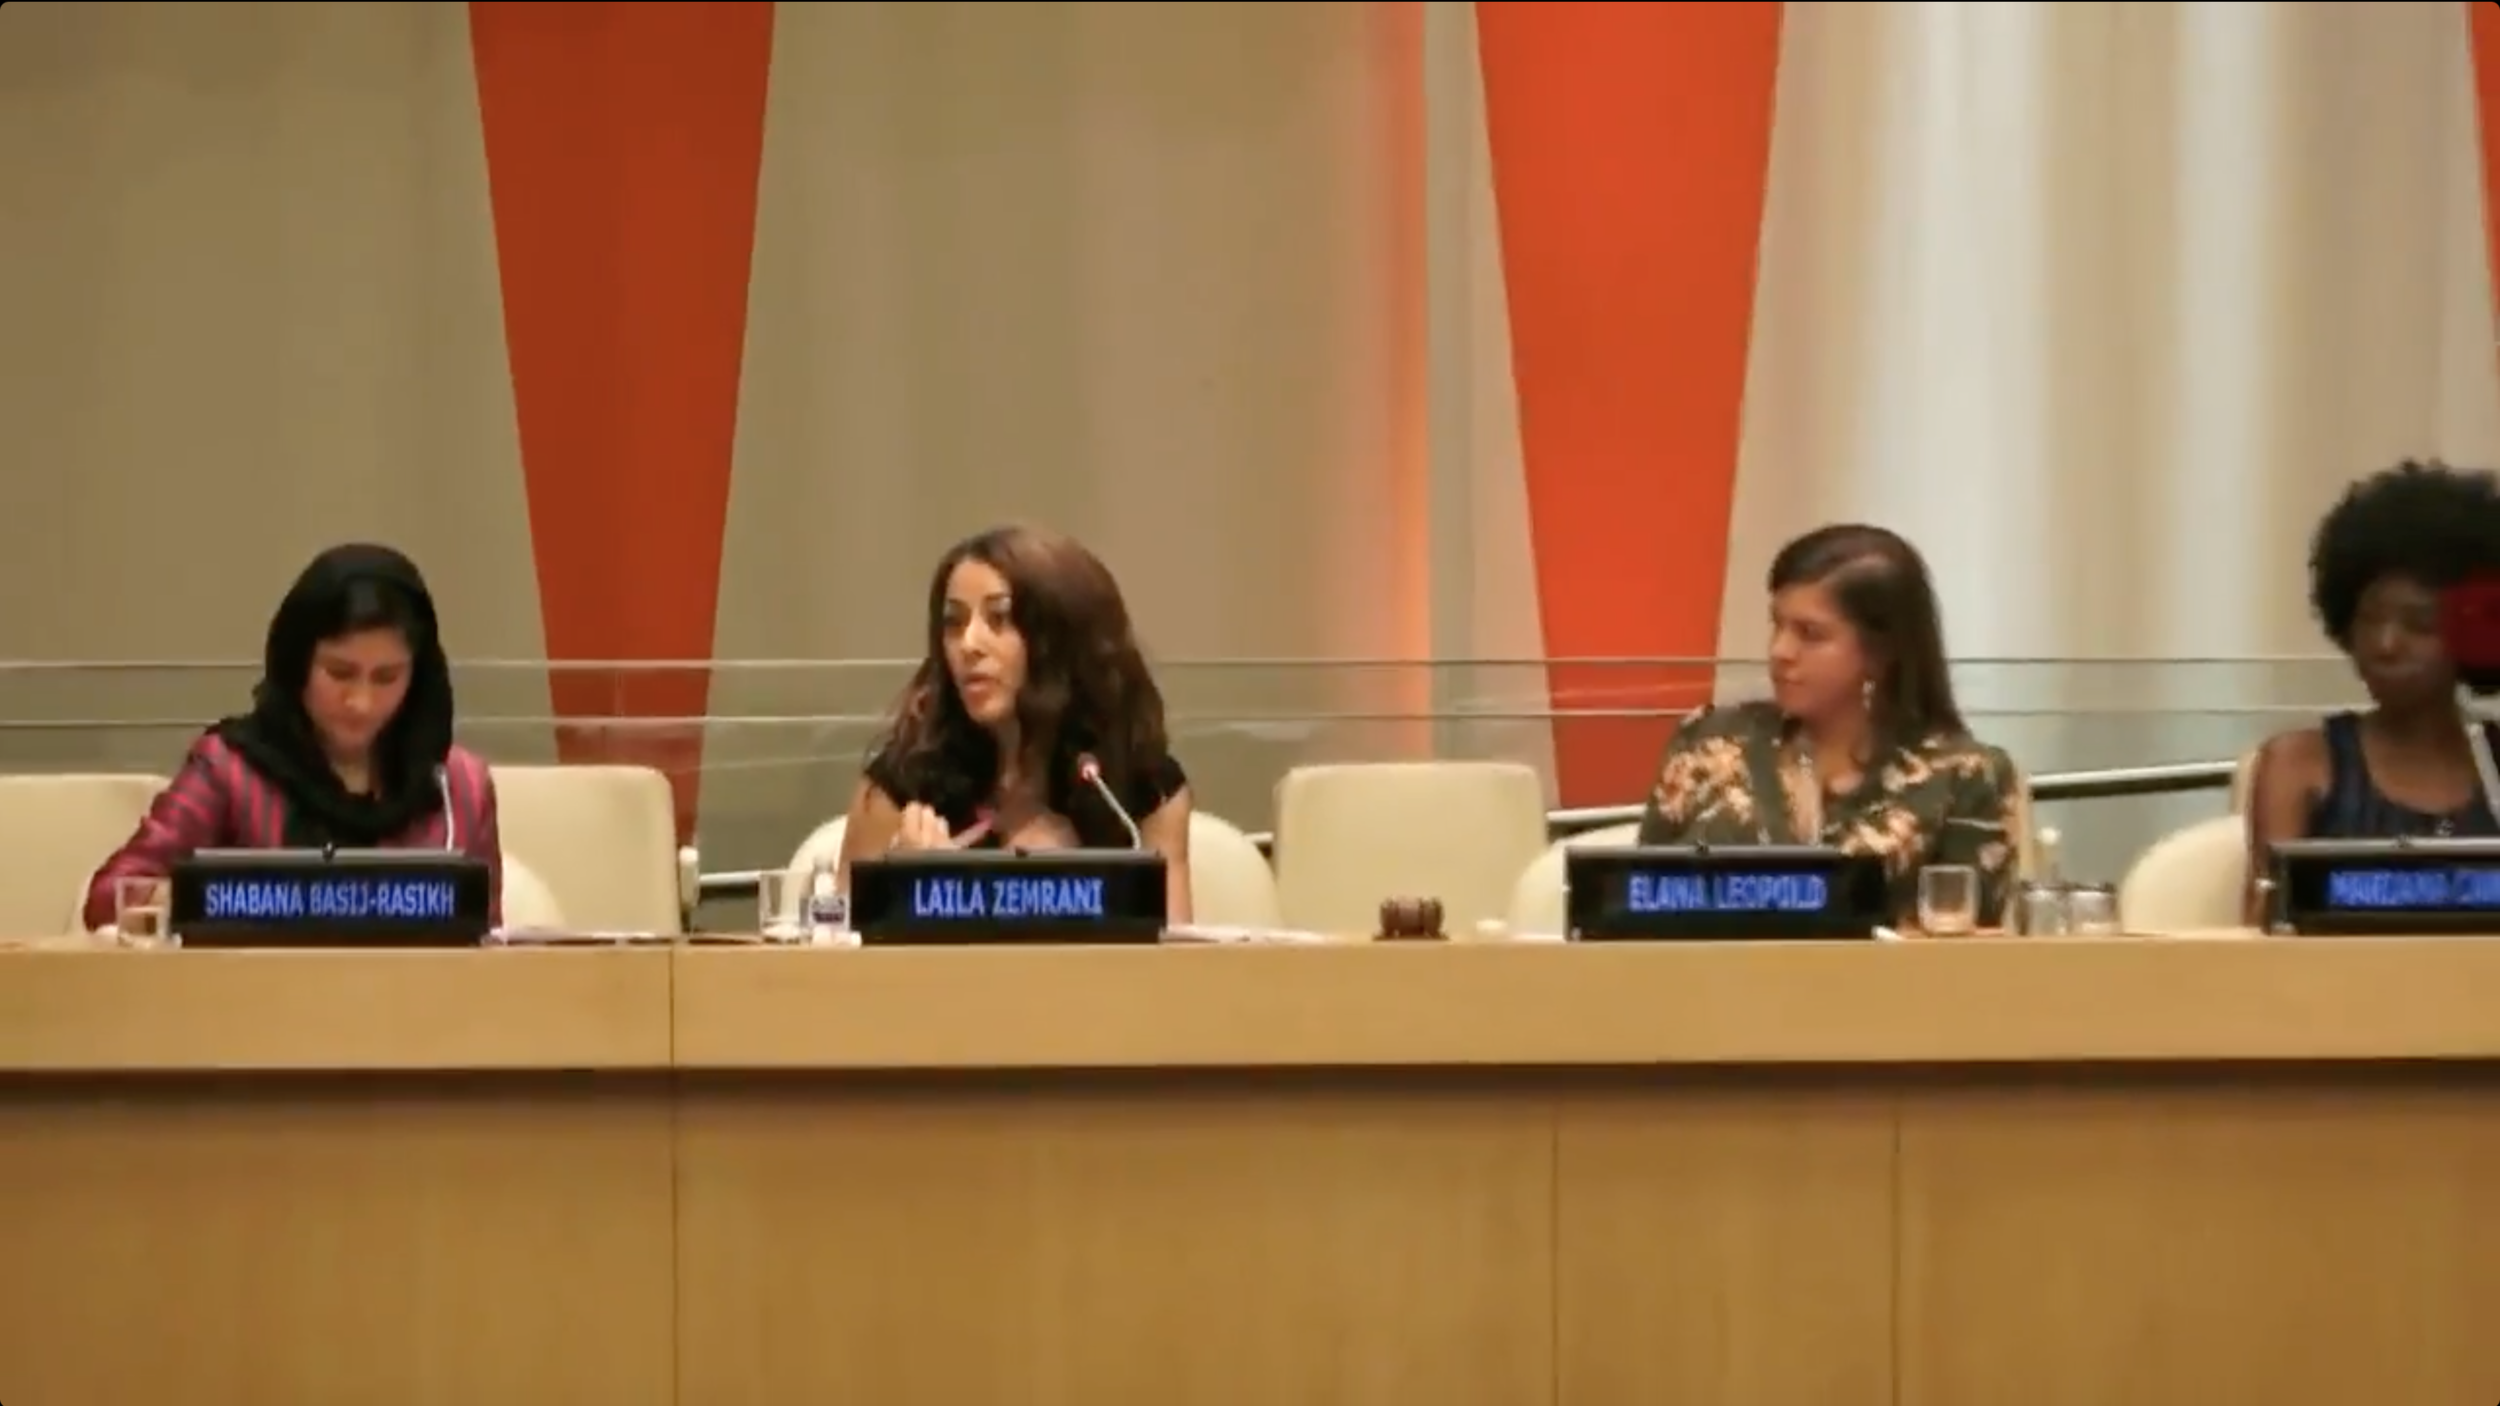 Laila Zemrani presenting at the United Nations